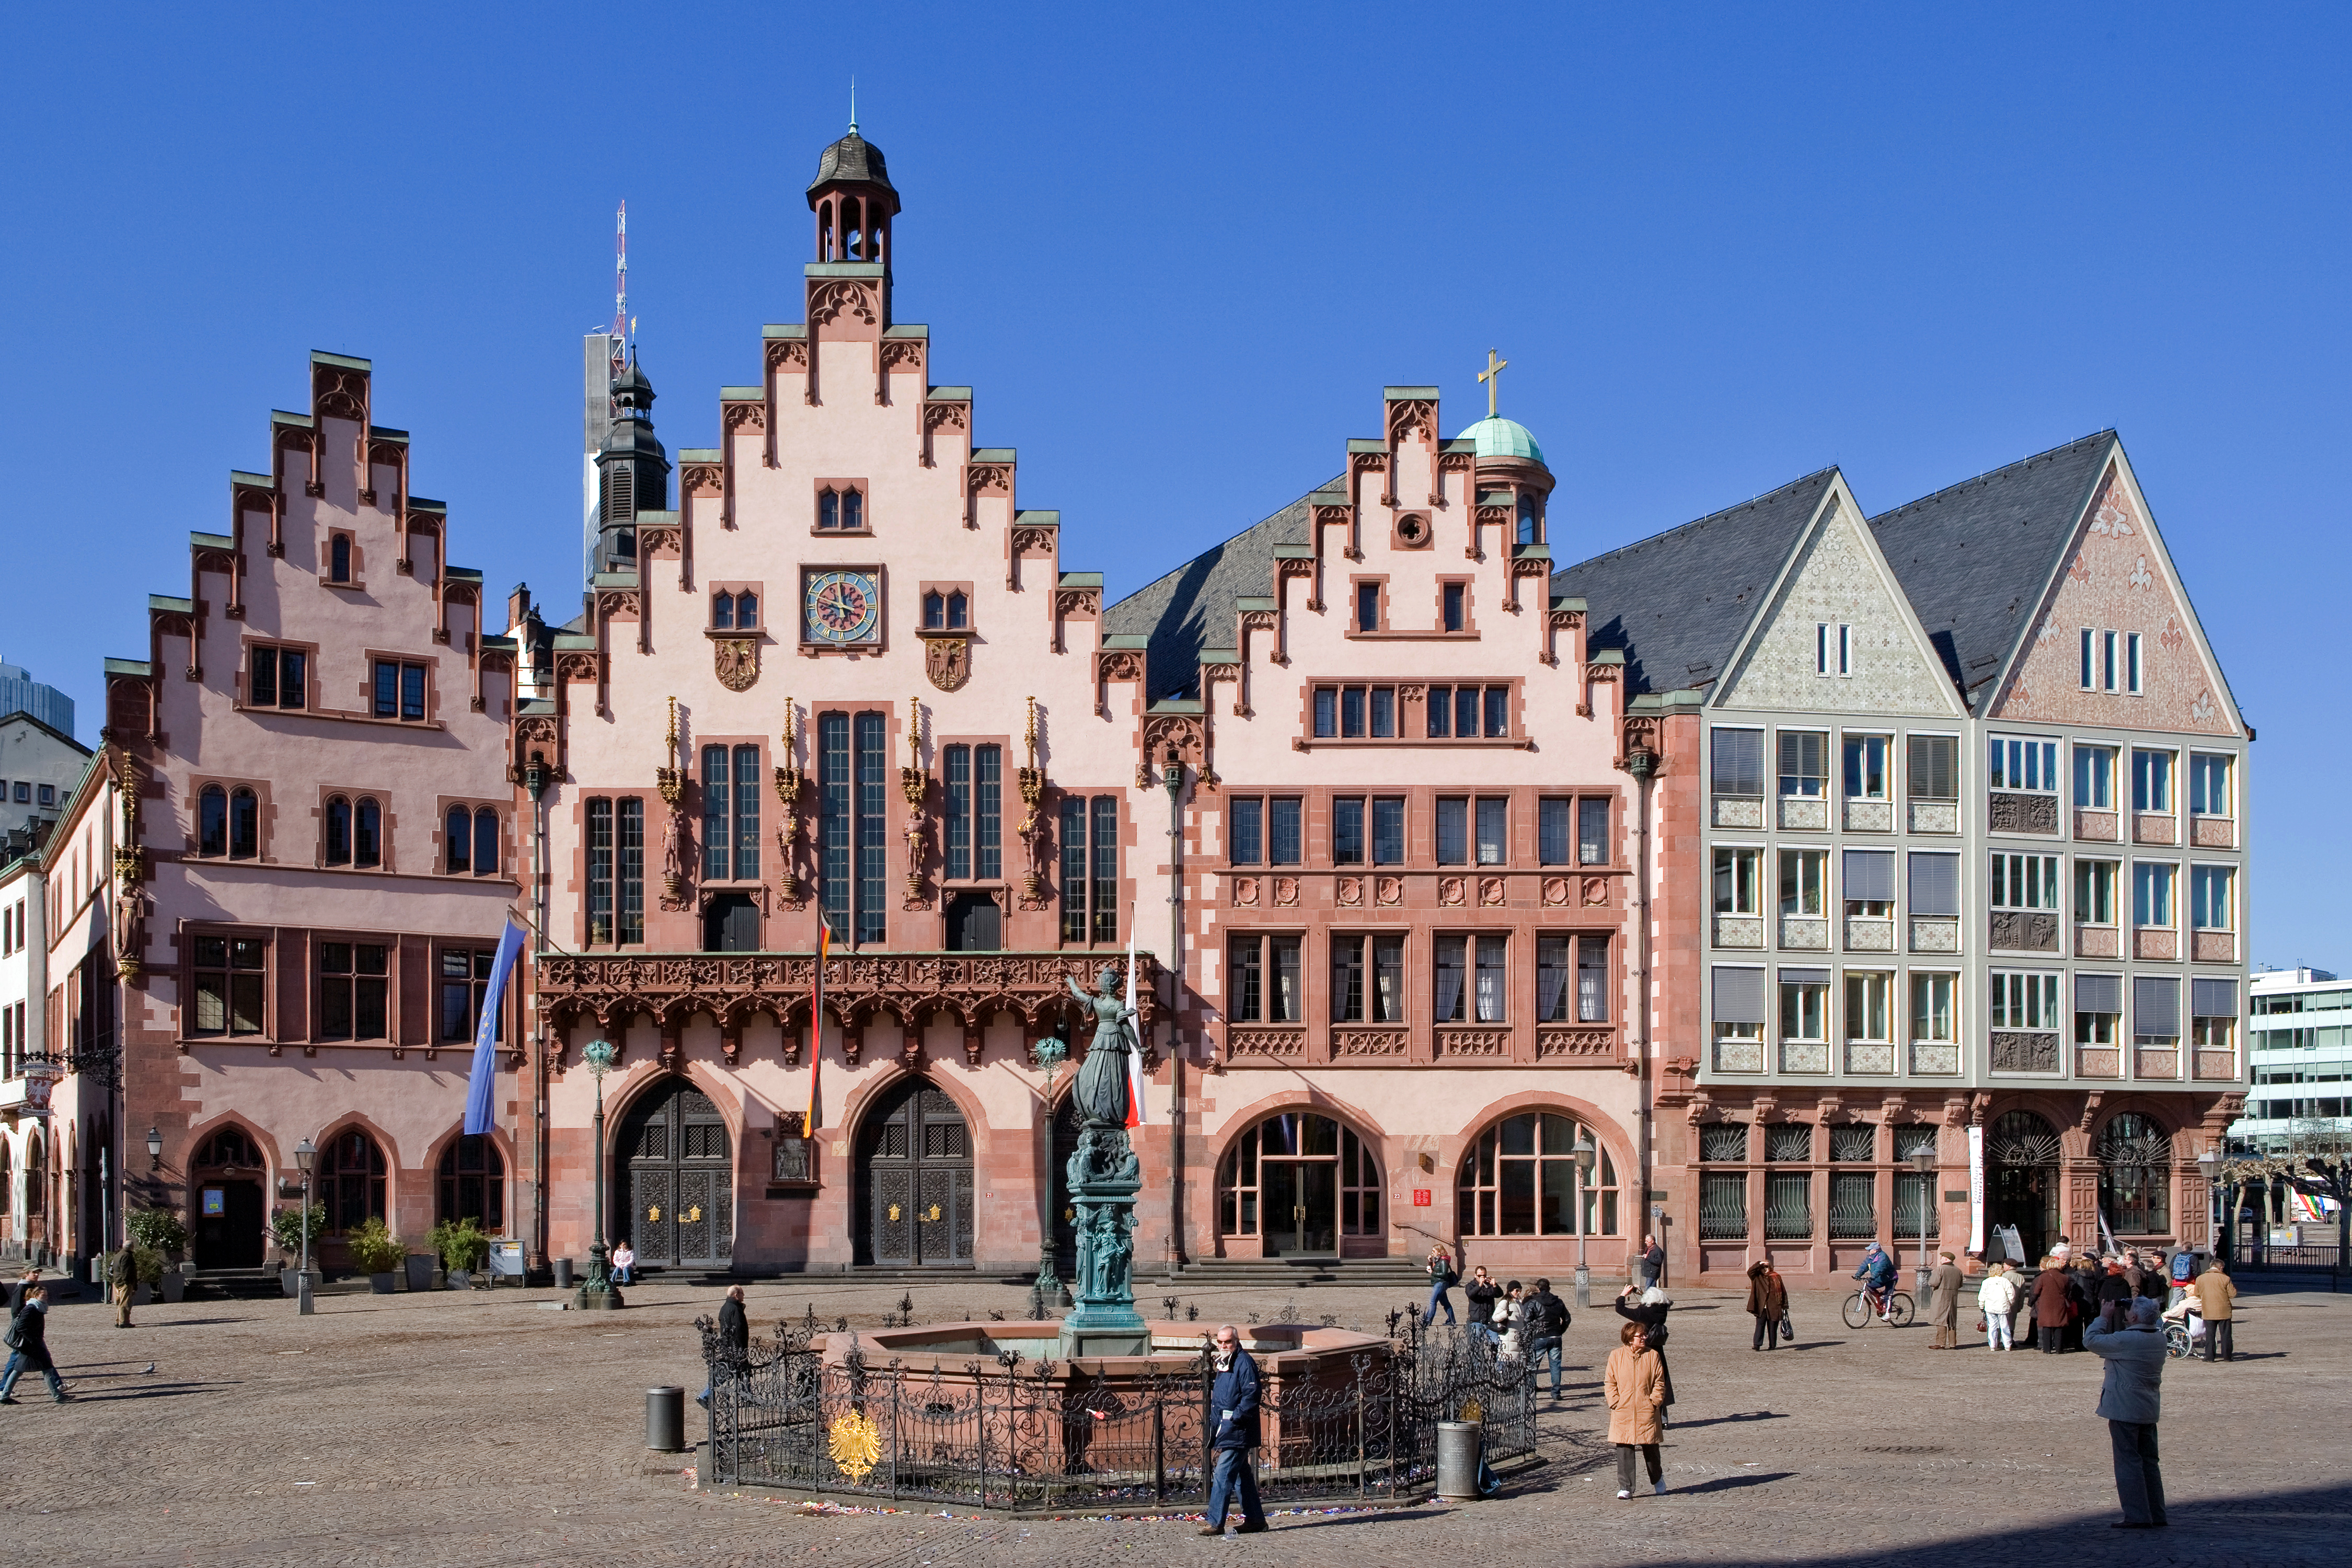 Cafe Platz Frankfurt